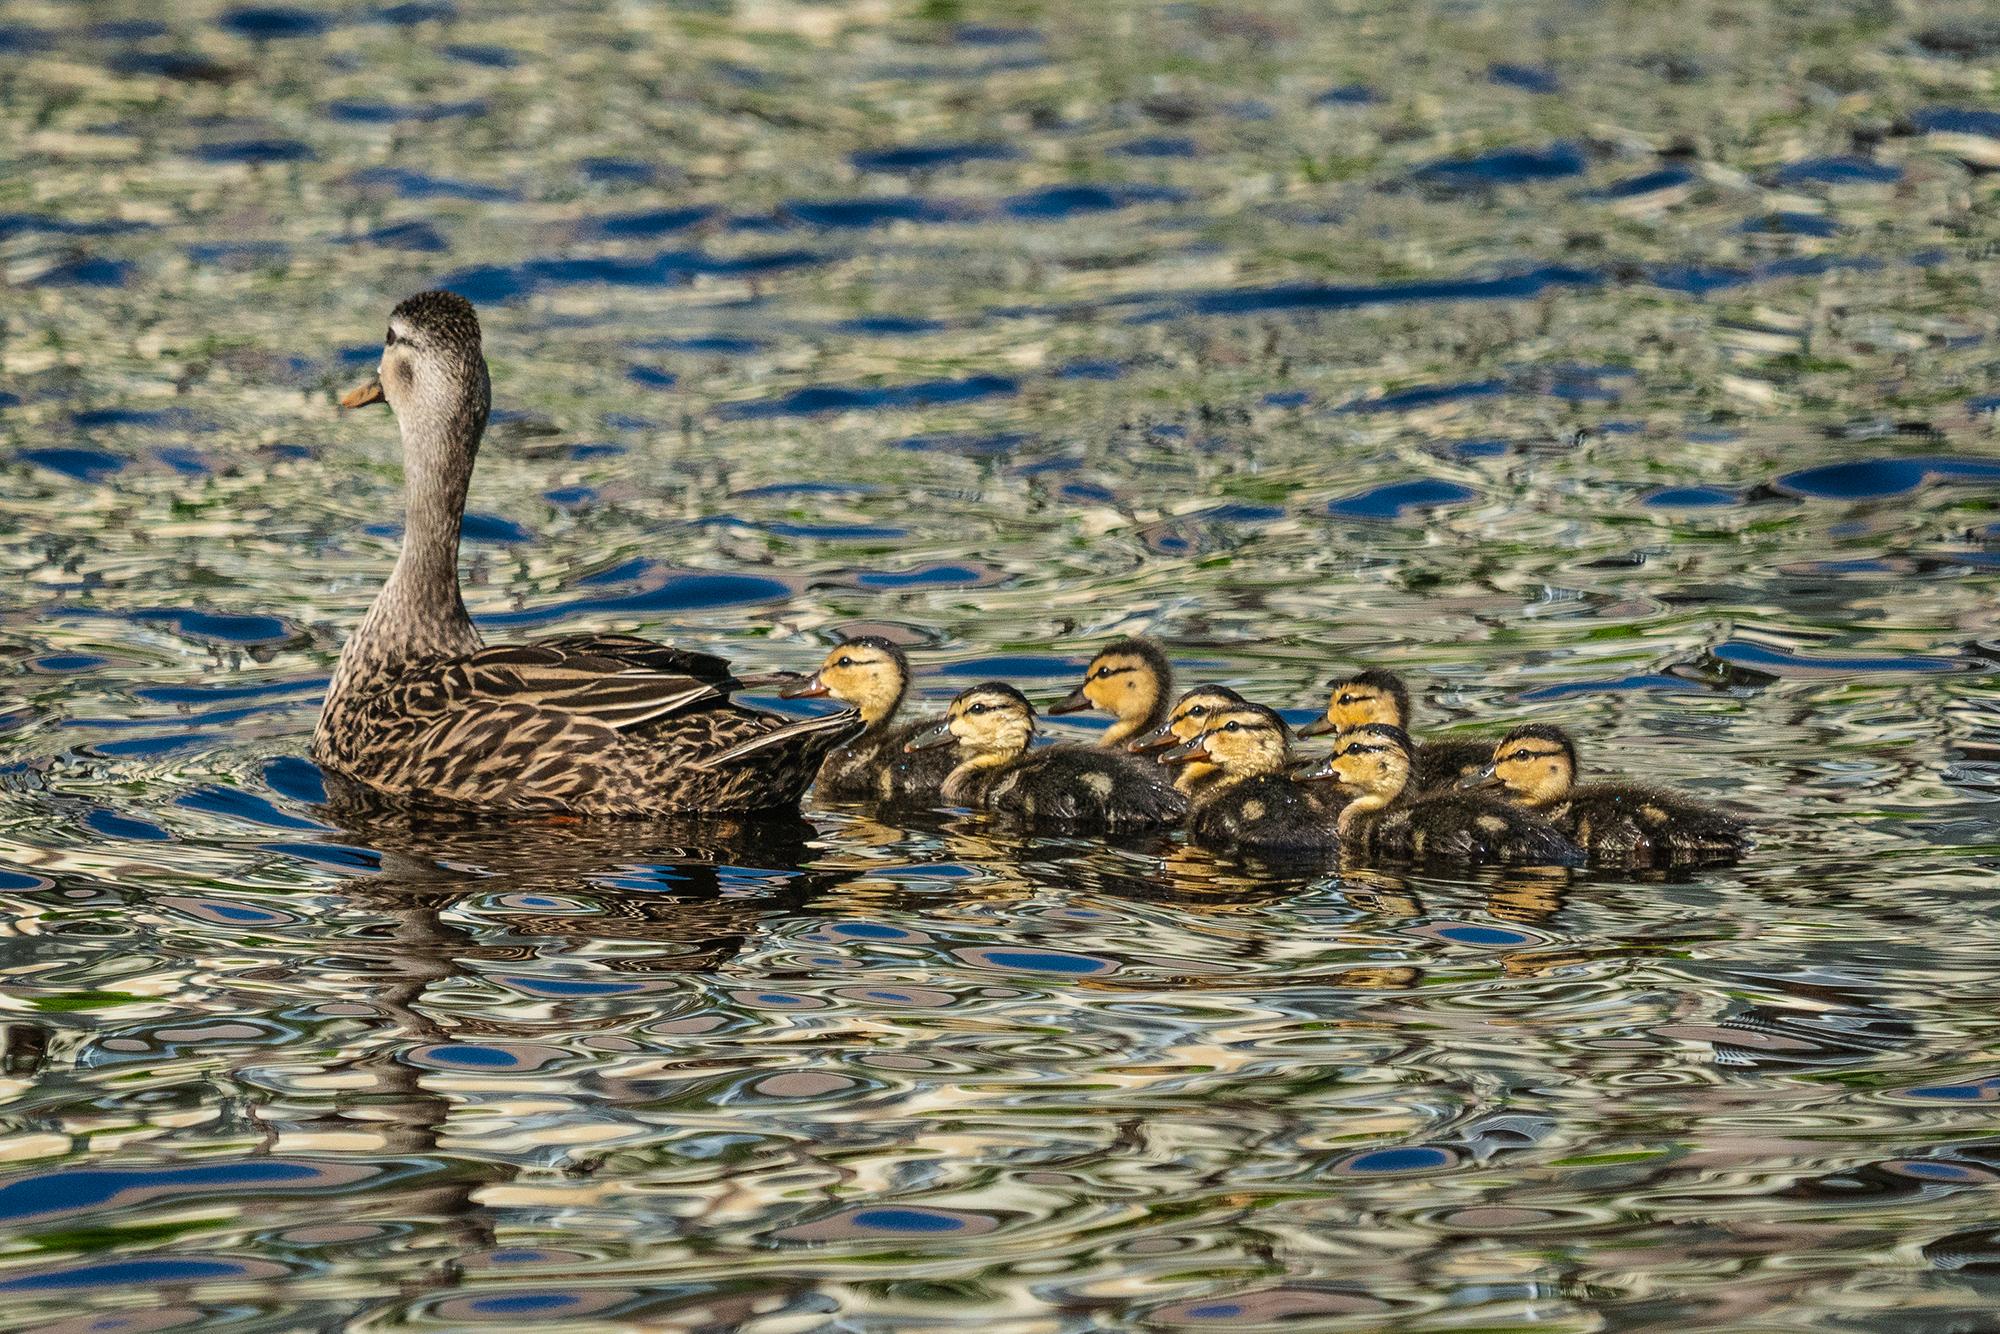 #ducklings, #duck, #mother, #lake, #swim, #morning, #sony, #family, #wildlife, #naples, #florida, #nature, #spring